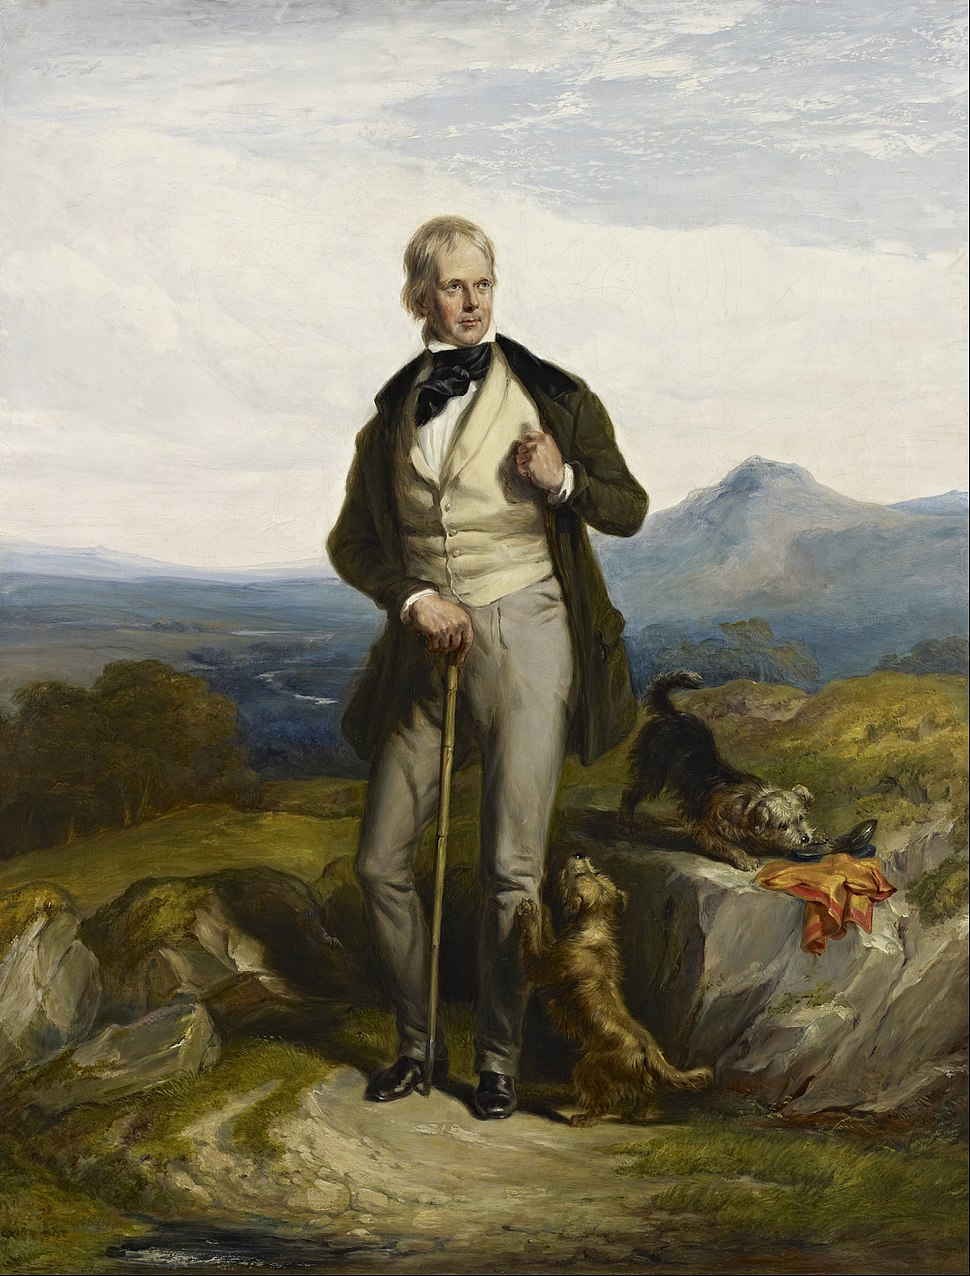 Sir William Allan - Sir Walter Scott, 1771 - 1832. Novelist and poet - Google Art Project